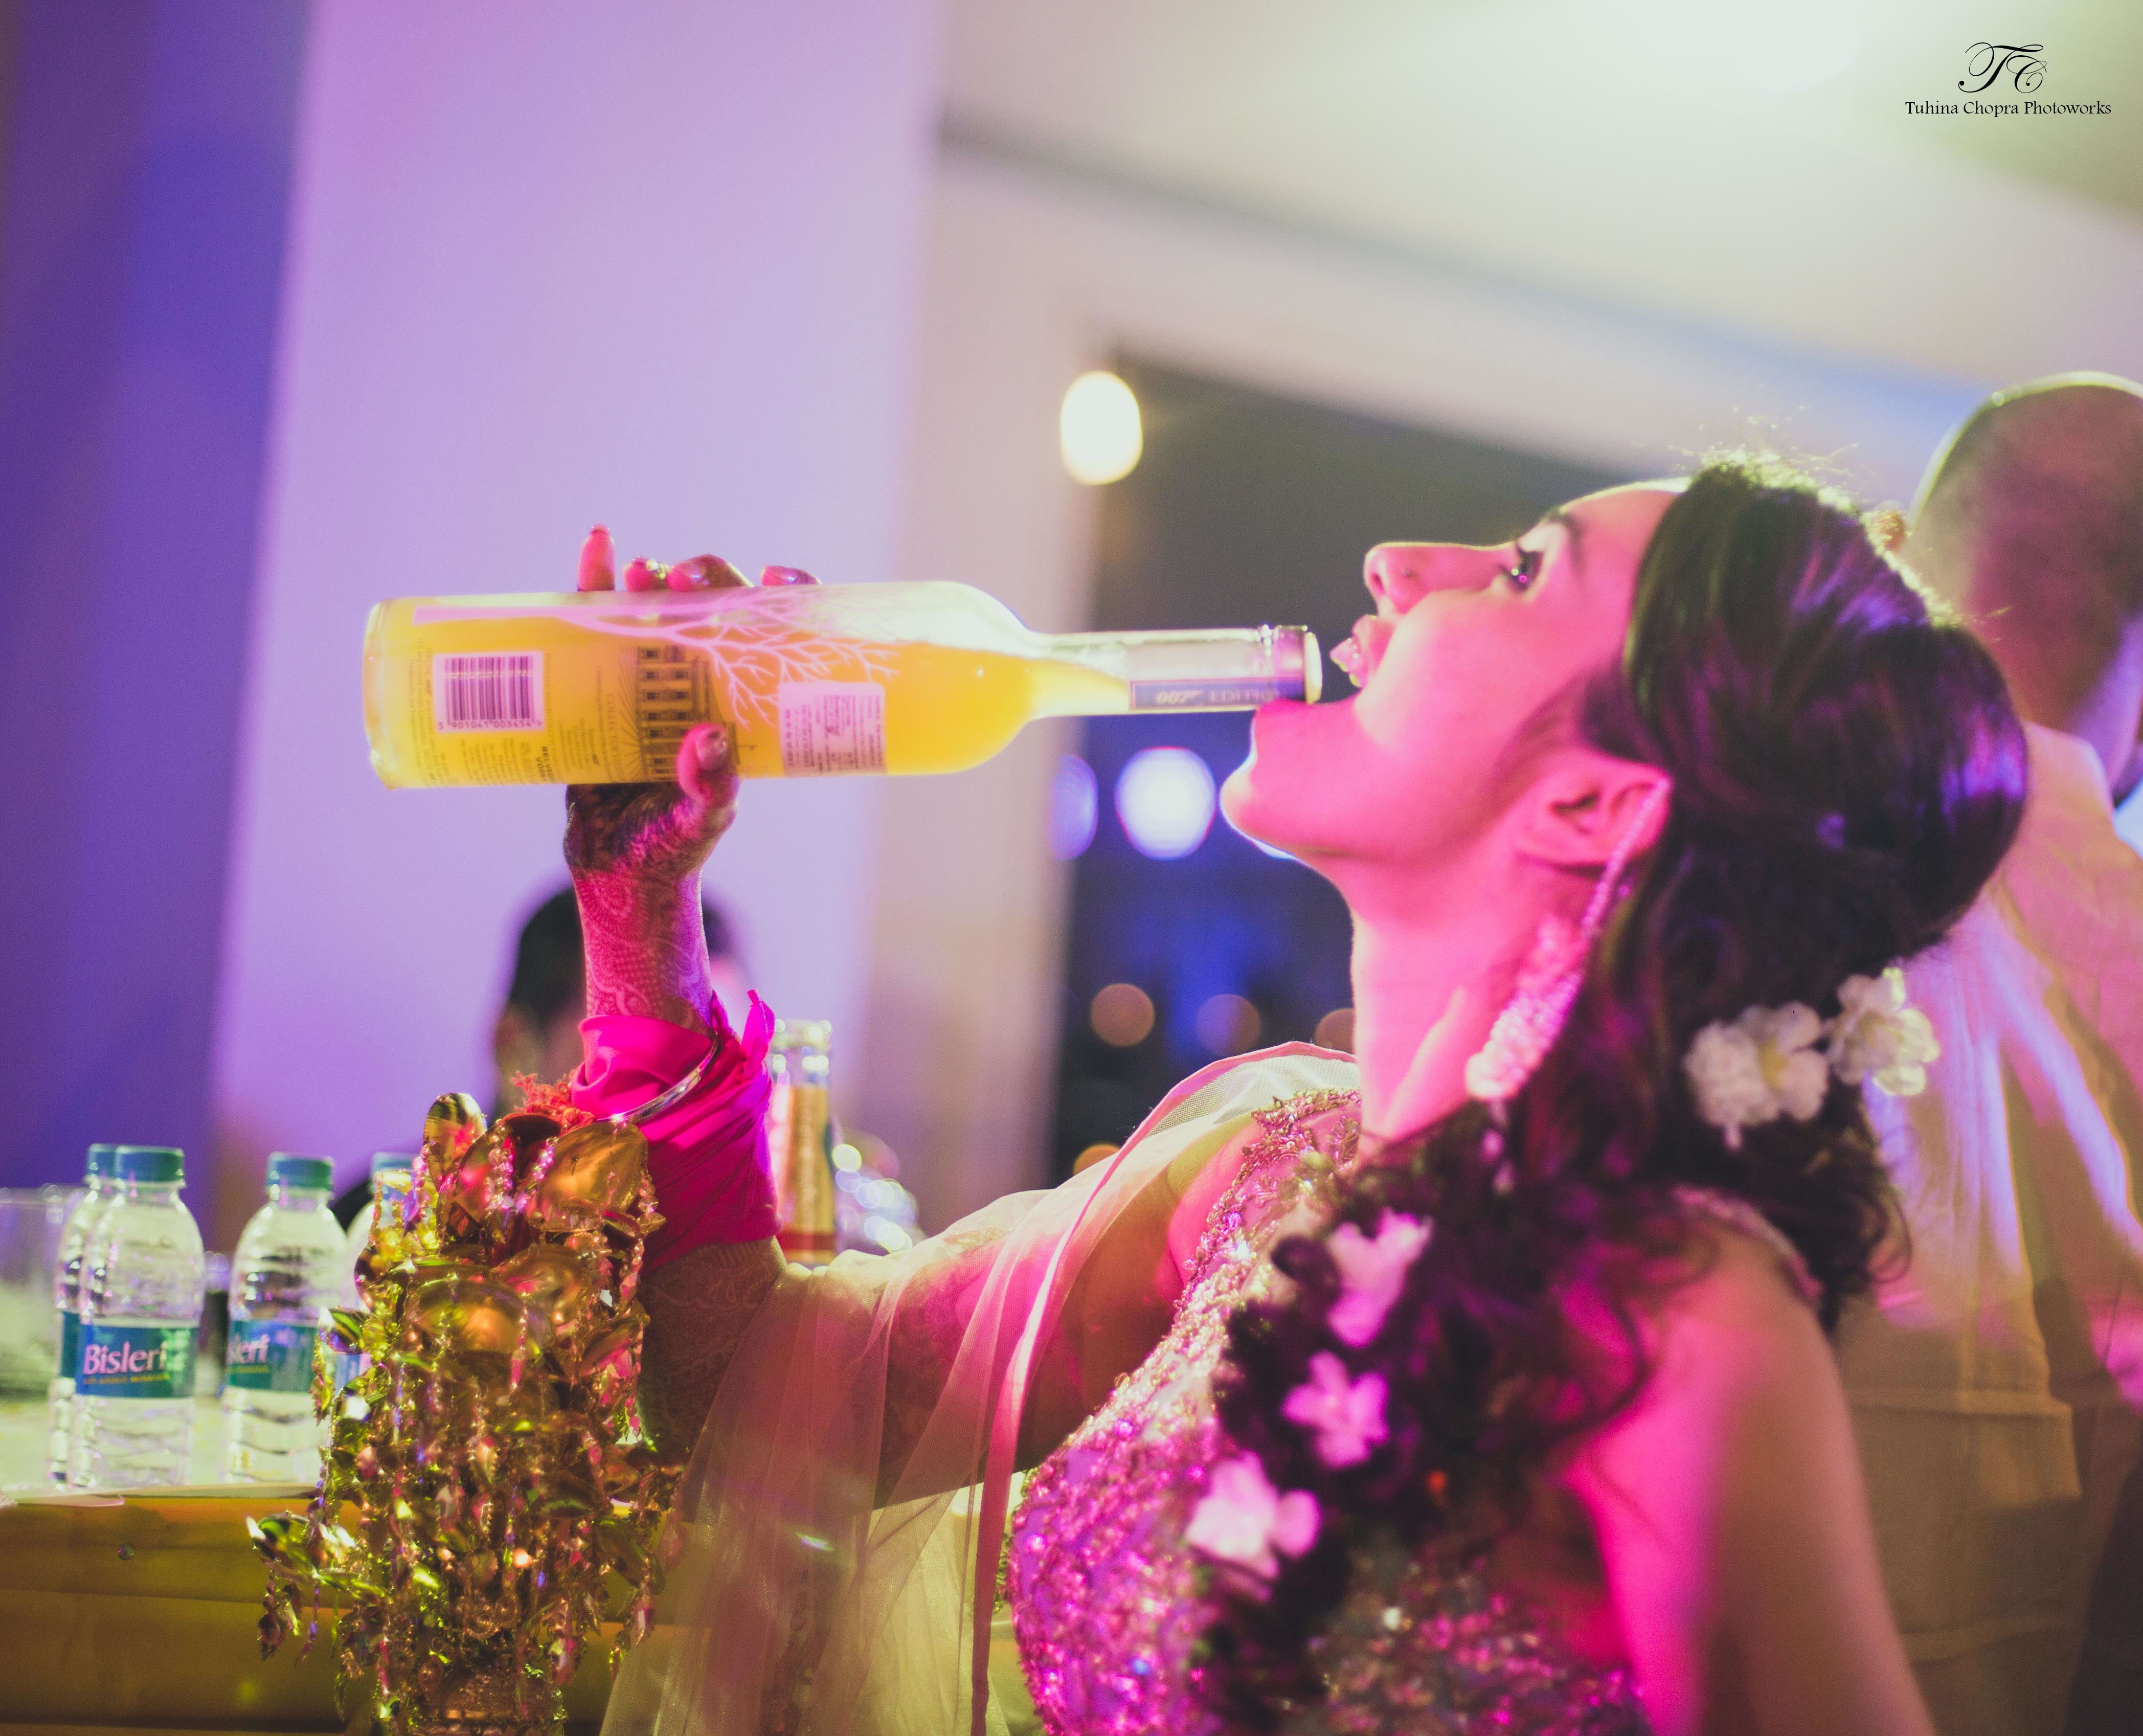 the bride swat:tuhina chopra photoworks